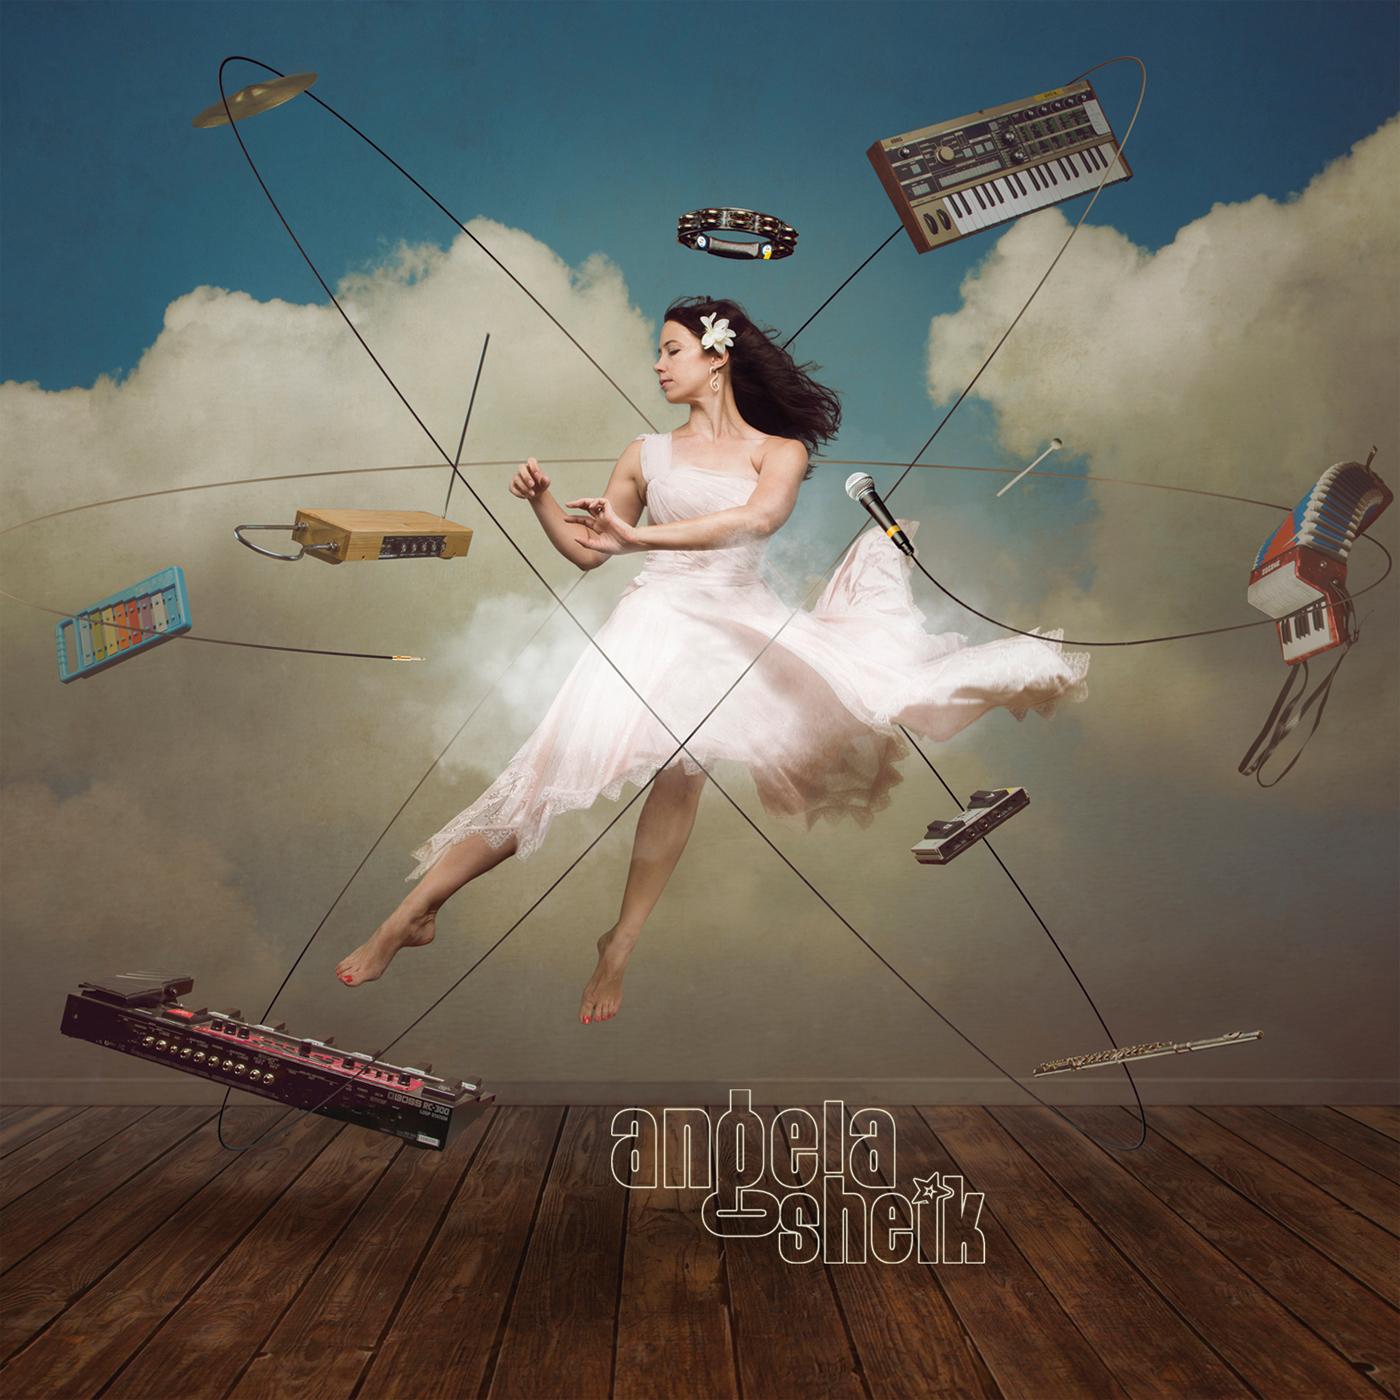 angela sheik - CDbaby-Home Before Dark Album Cover copy.jpg